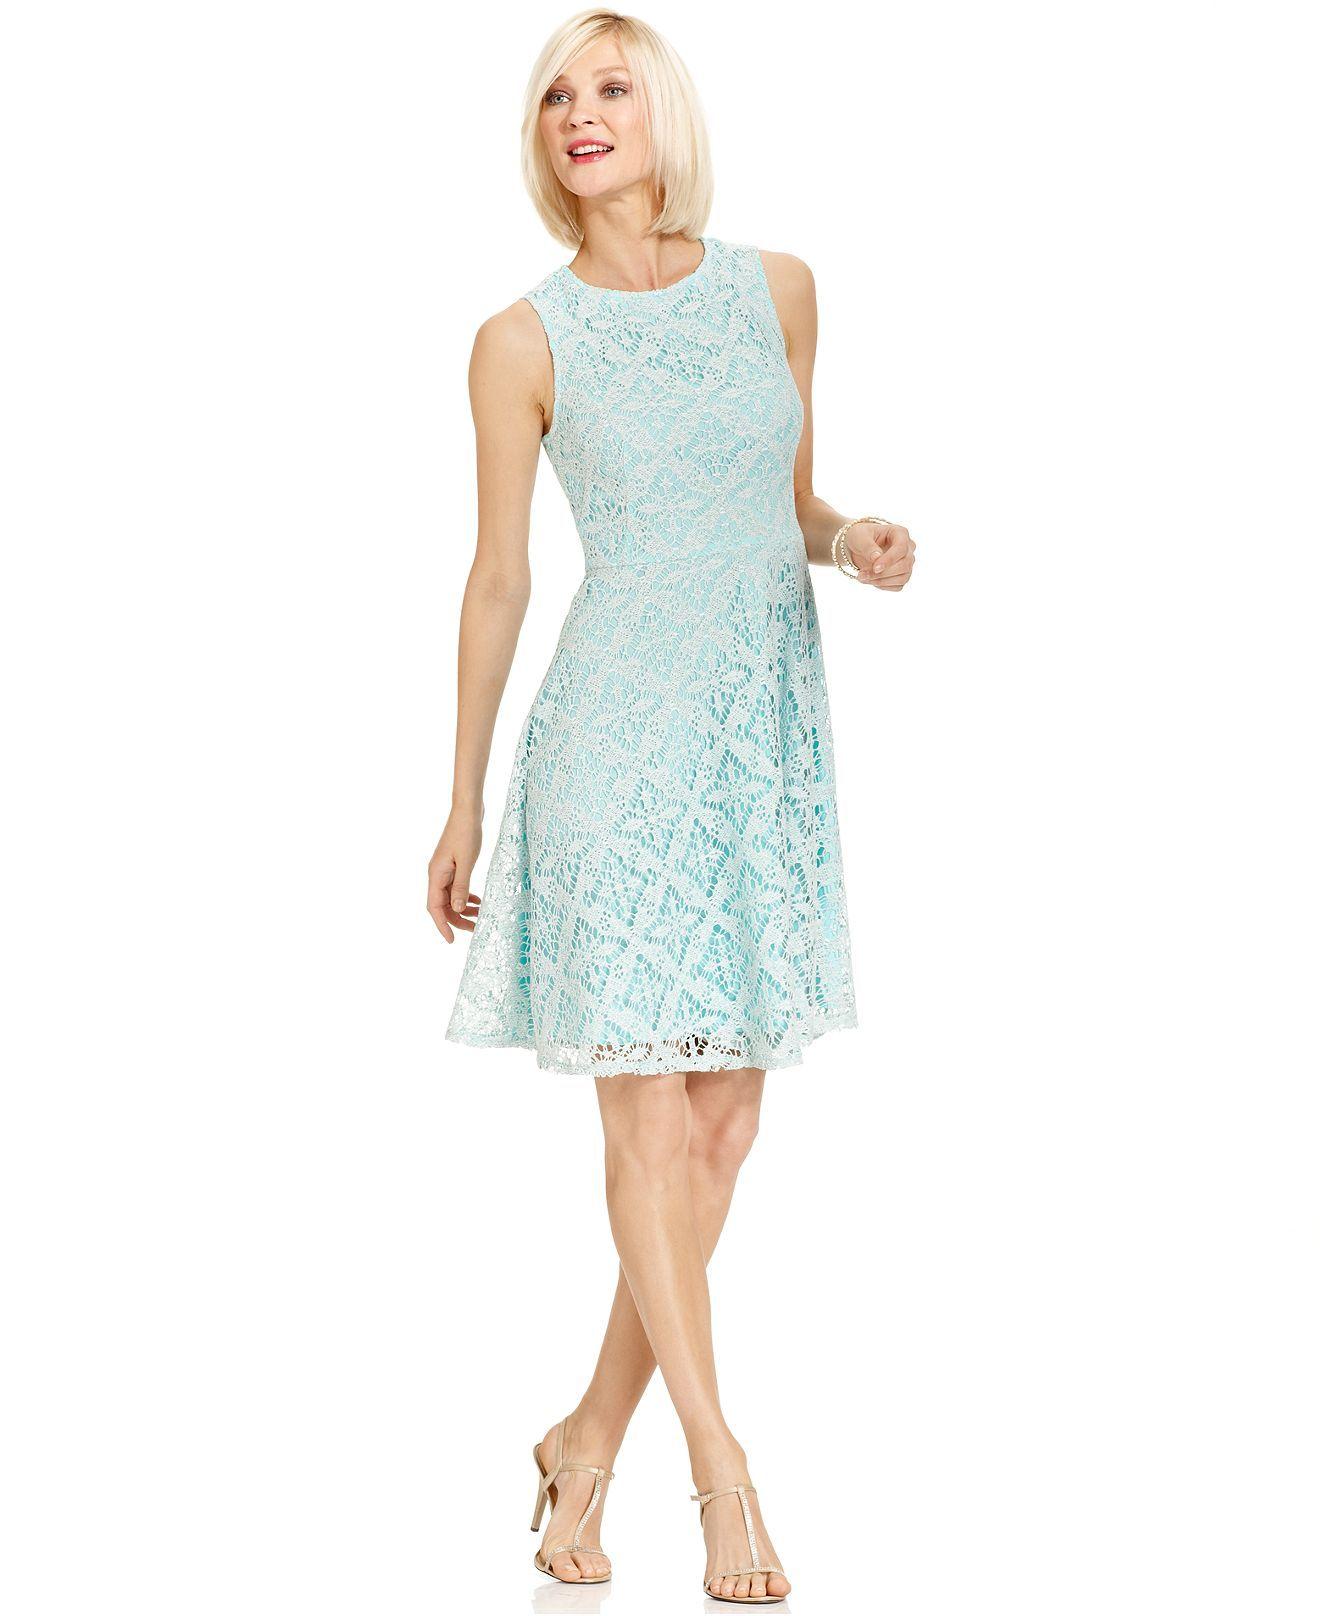 Macy's party dresses weddings  London Times Dress Sleeveless CrochetLace ALine  Womens Dresses